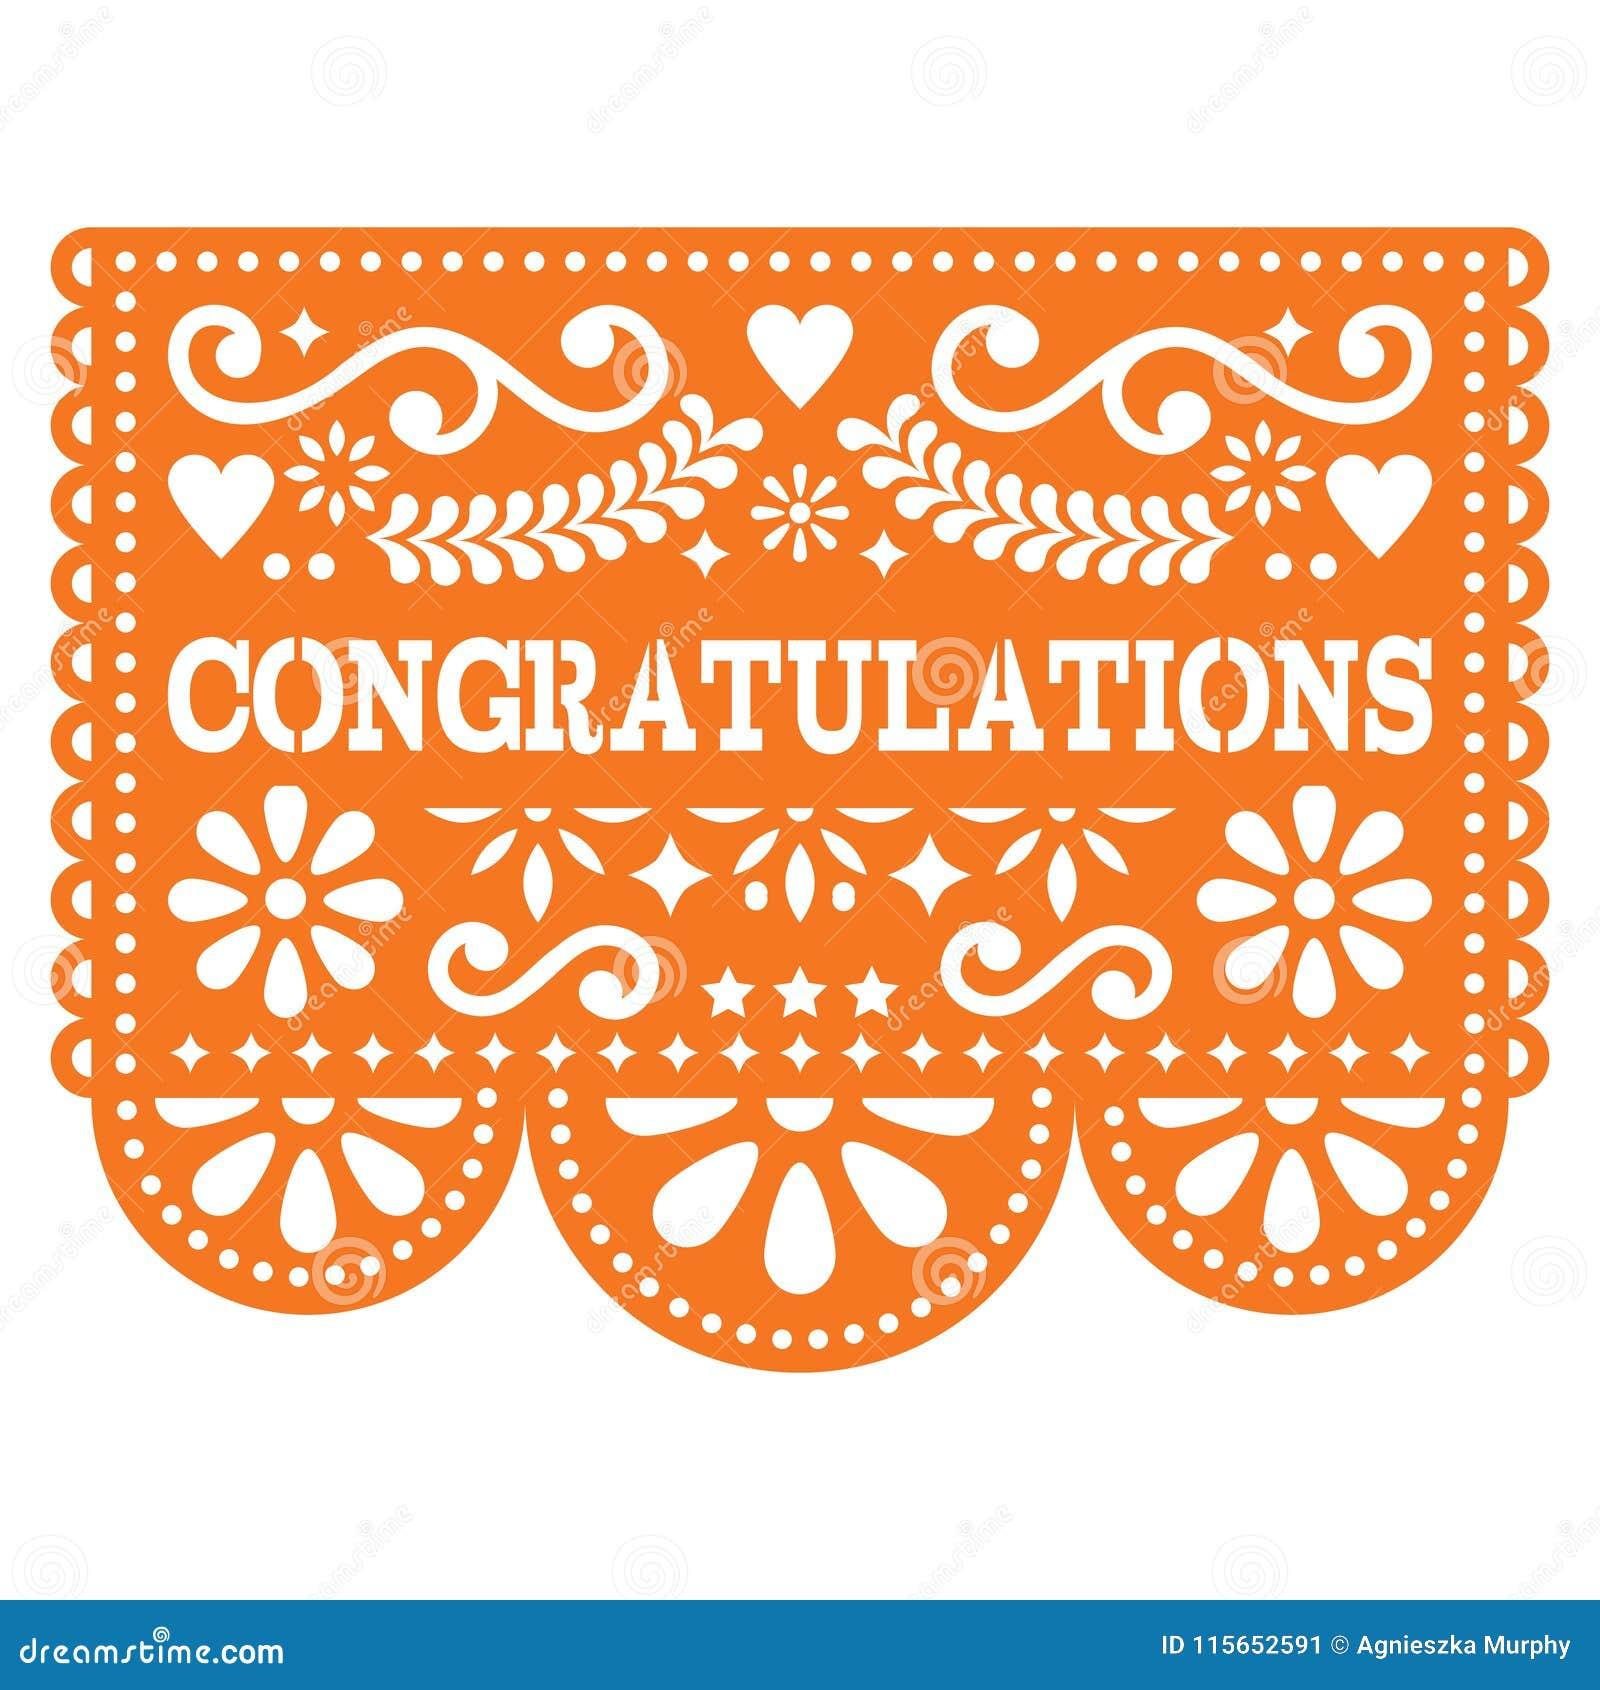 Congratulations Papel Picado Vector Design Greeting Card Mexican